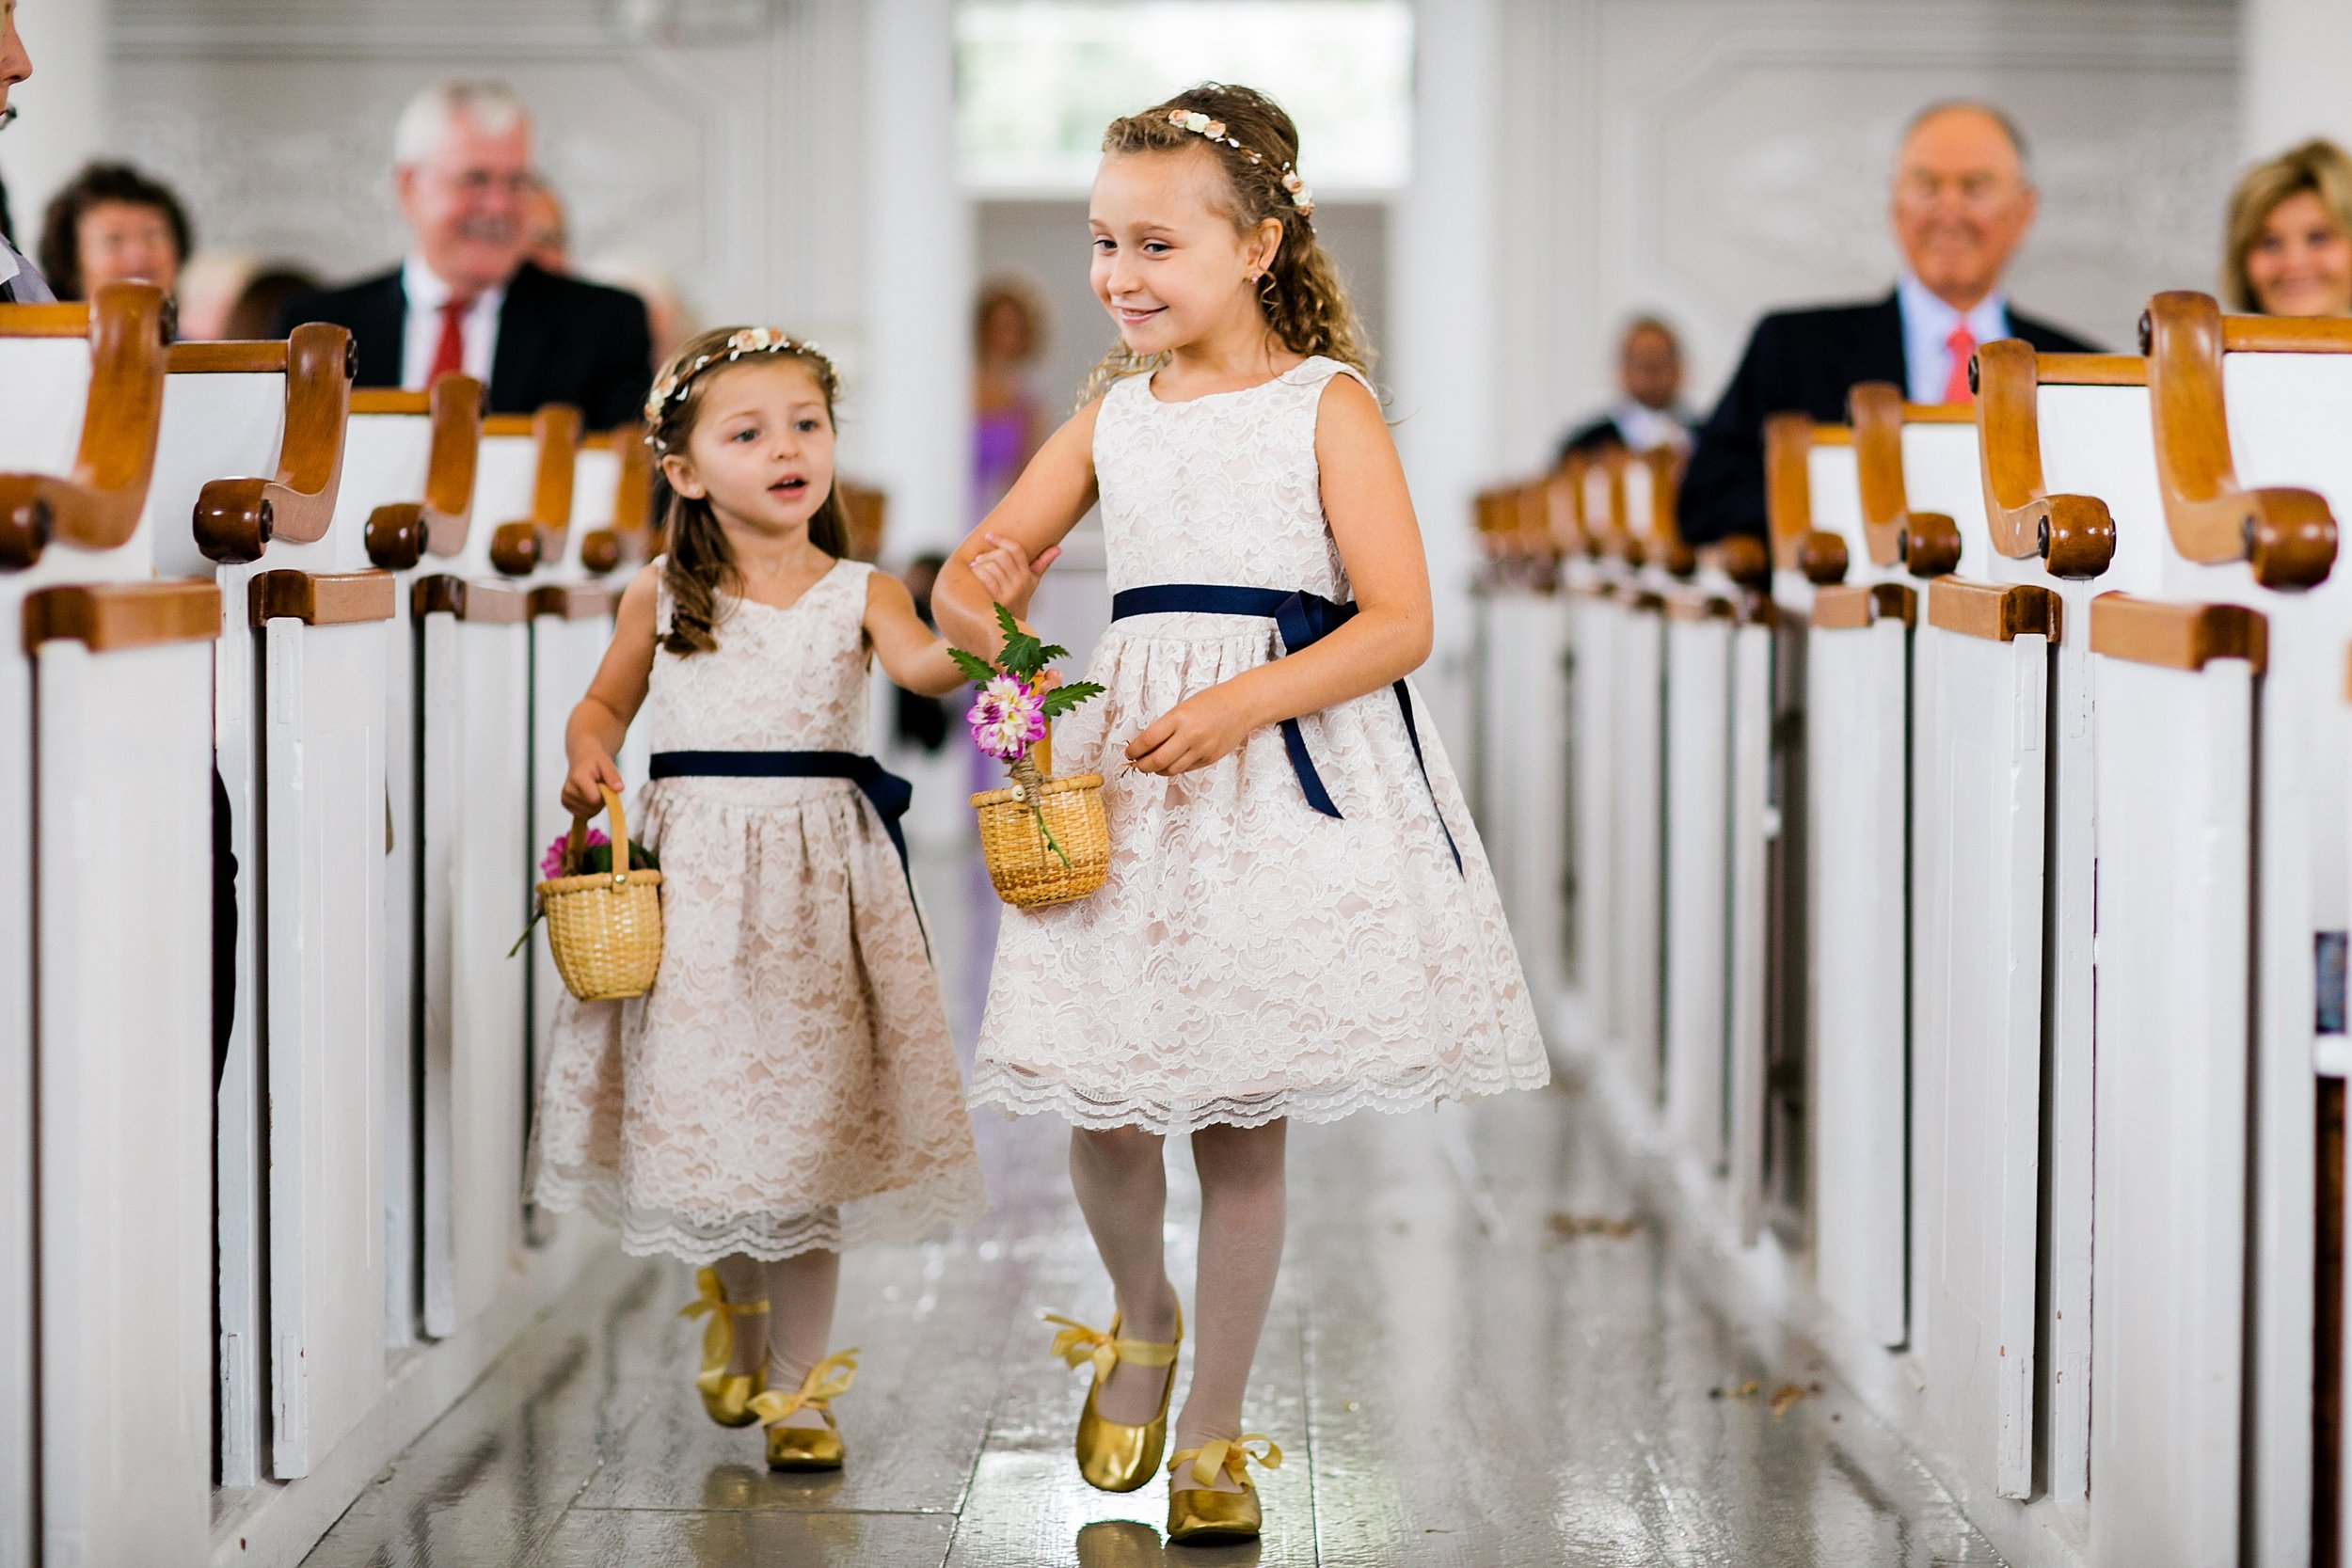 025 marthas vineyard wedding photographer todd danforth photography.jpg